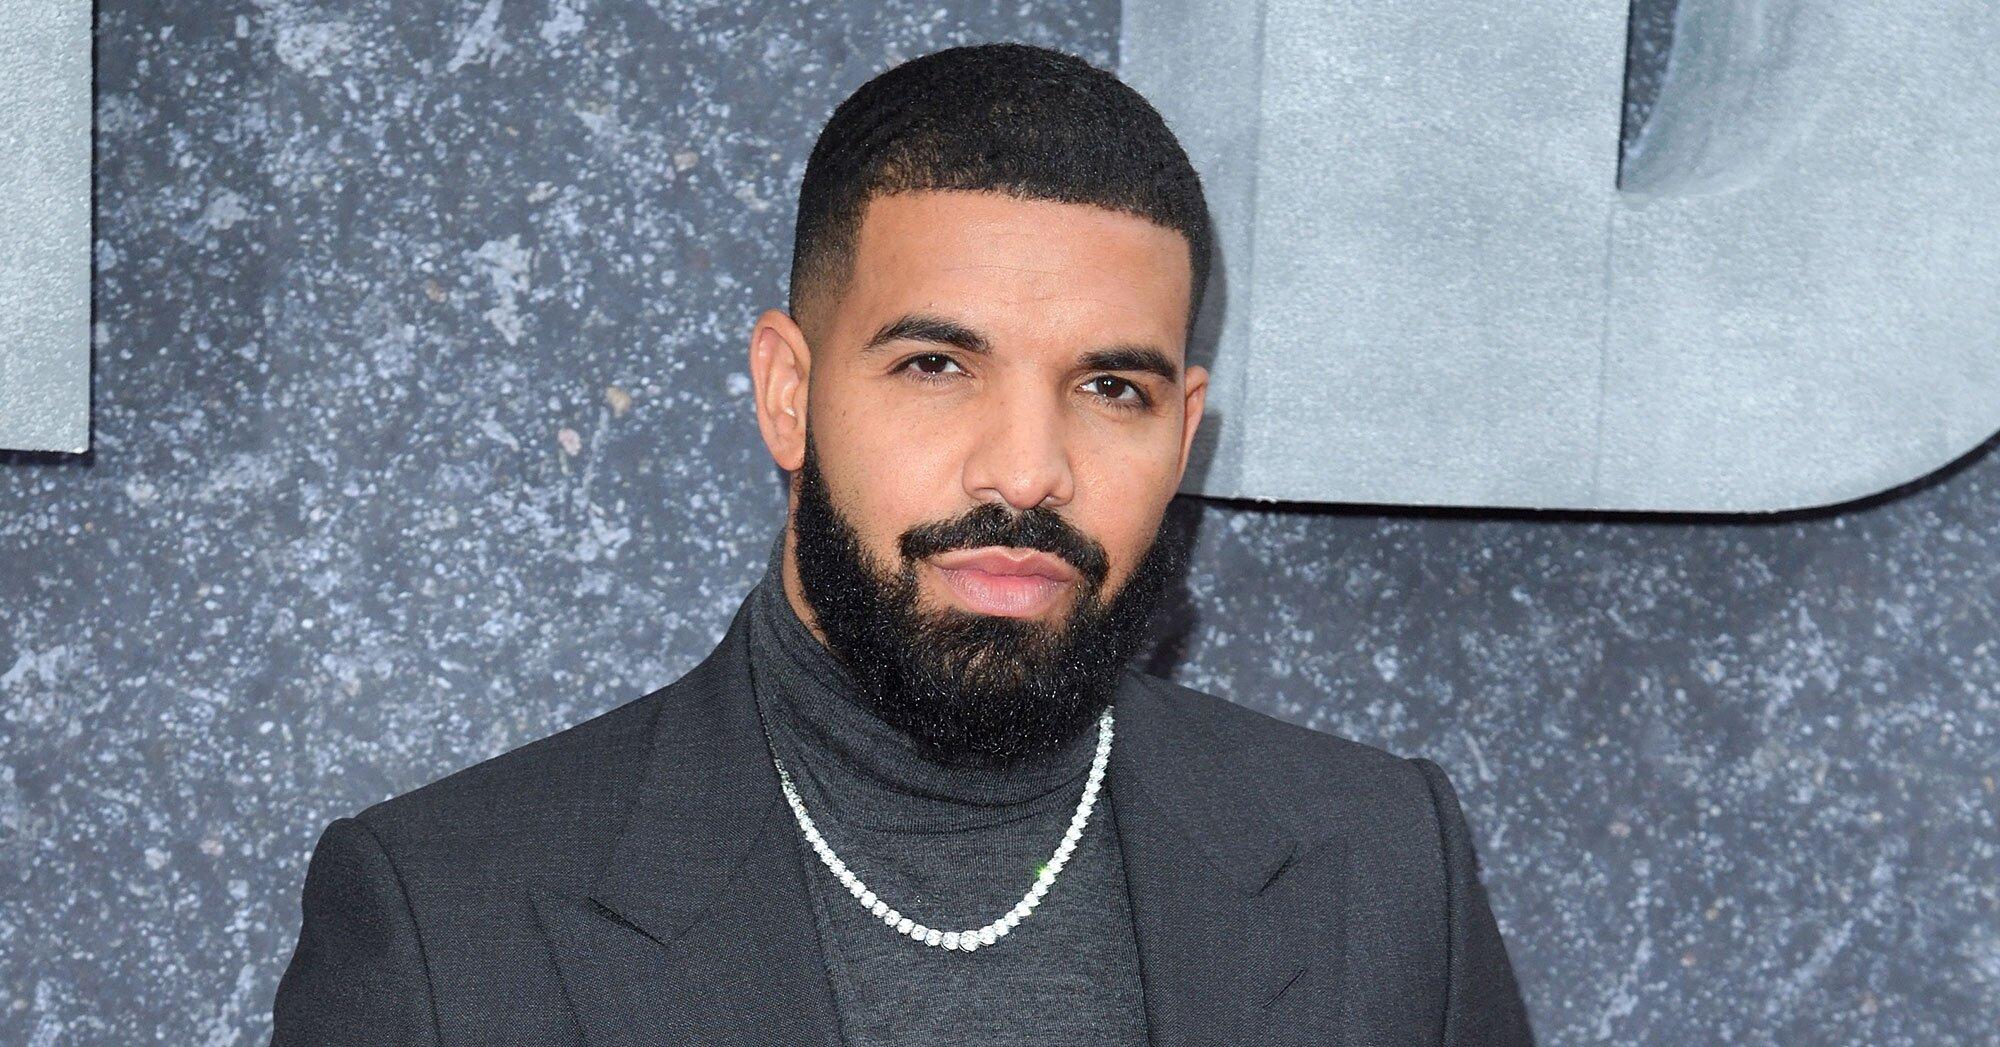 Drake S Toosie Slide Debuts At No 1 On Billboard Hot 100 Ew Com